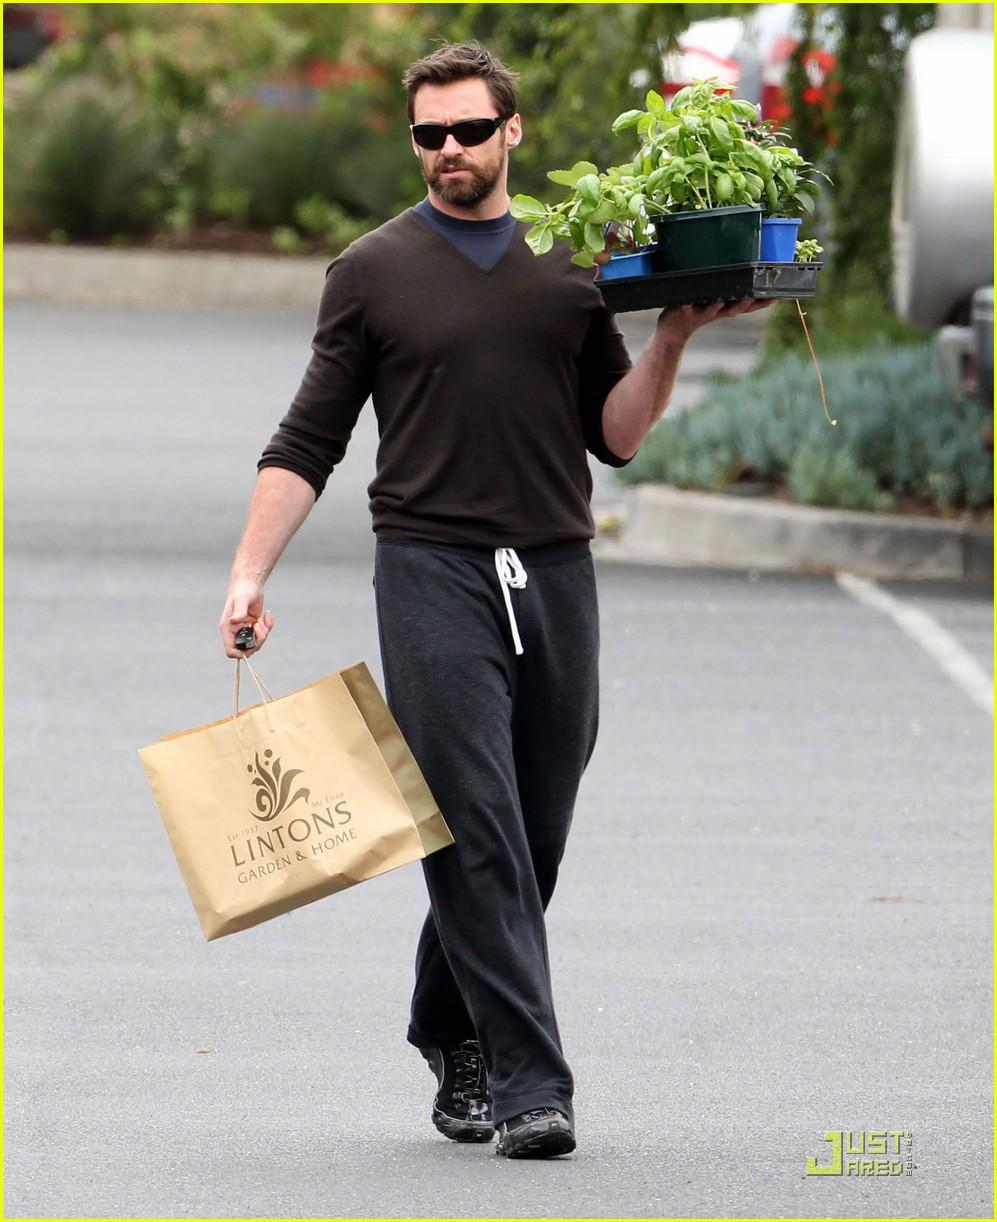 Elegant Hugh Jackman: Scruffy Garden Guy: Photo 2505161 | Ava Jackman, Celebrity  Babies, Deborra Lee Furness, Hugh Jackman, Oscar Jackman Pictures | Just  Jared